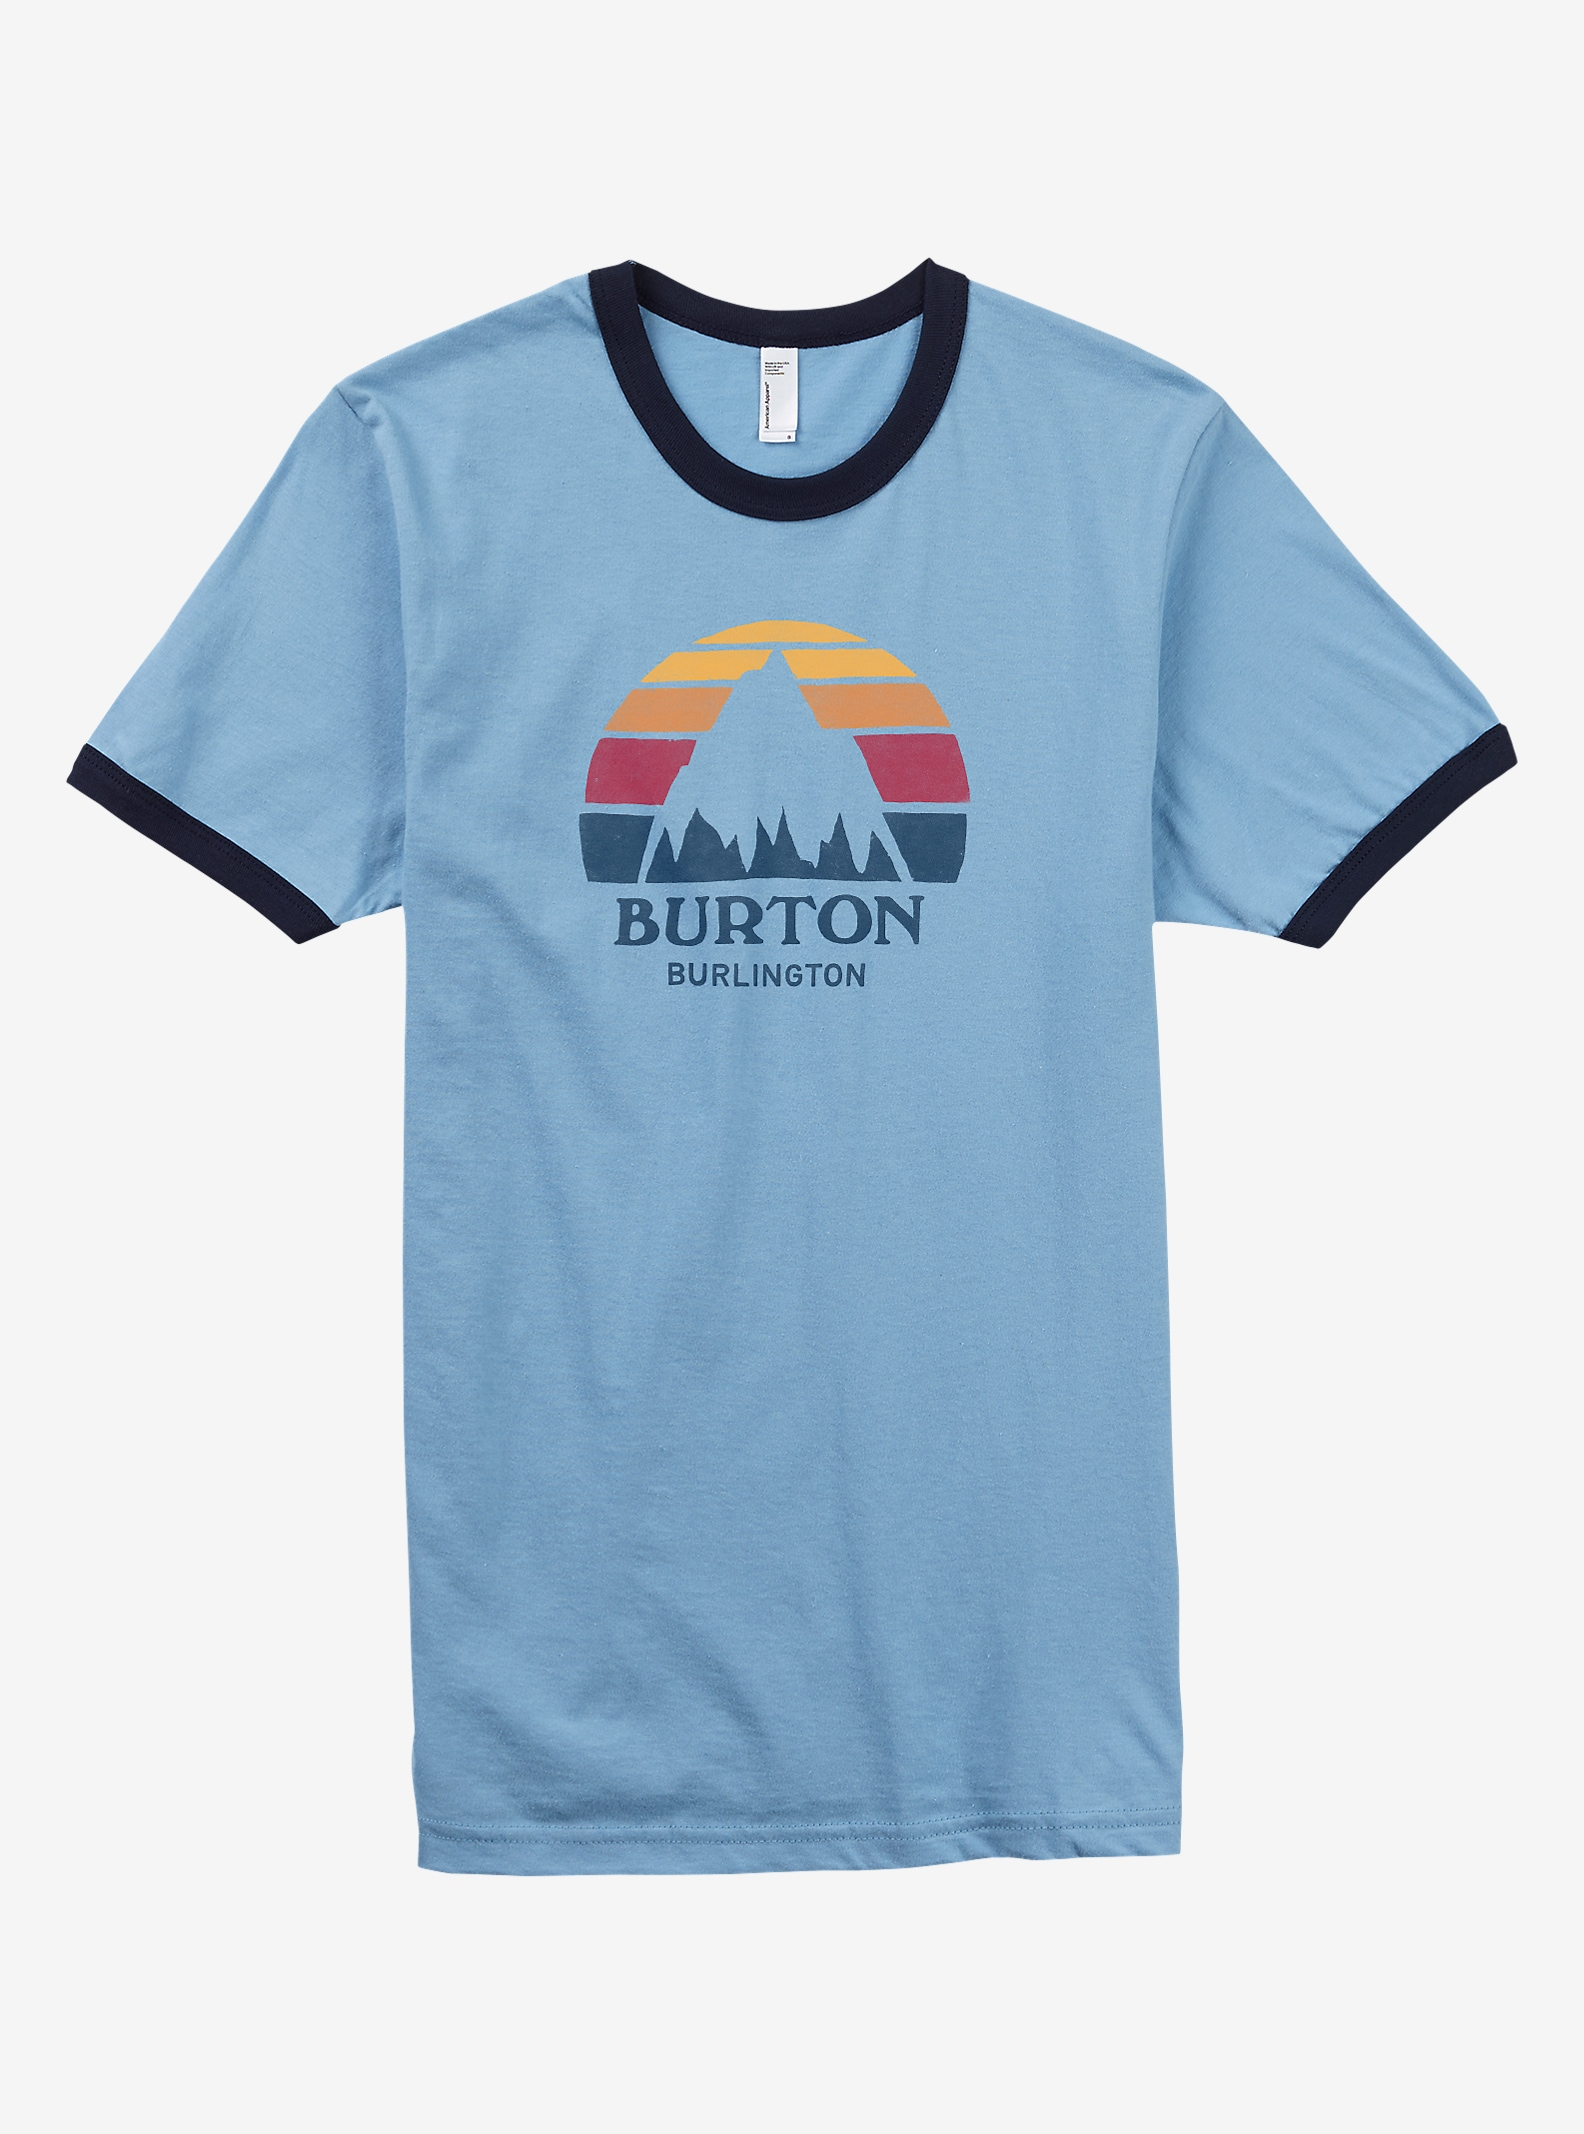 Burton City Underhill T Shirt shown in Burlington Light Blue